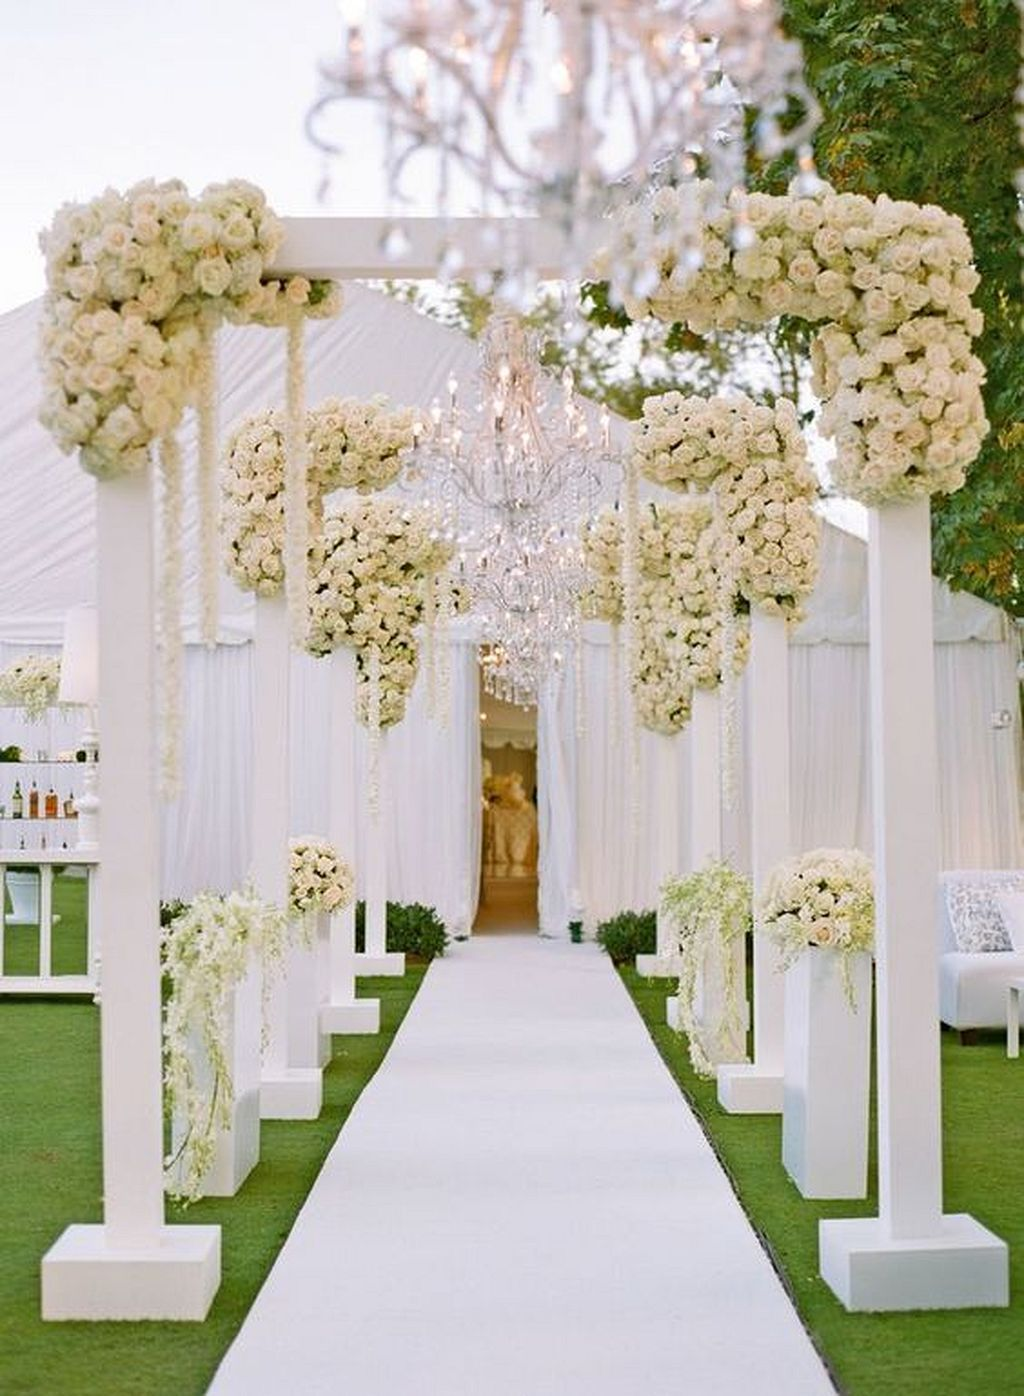 30+ Beautiful Wedding Entrance Decor Ideas | Pinterest | Entrance ...